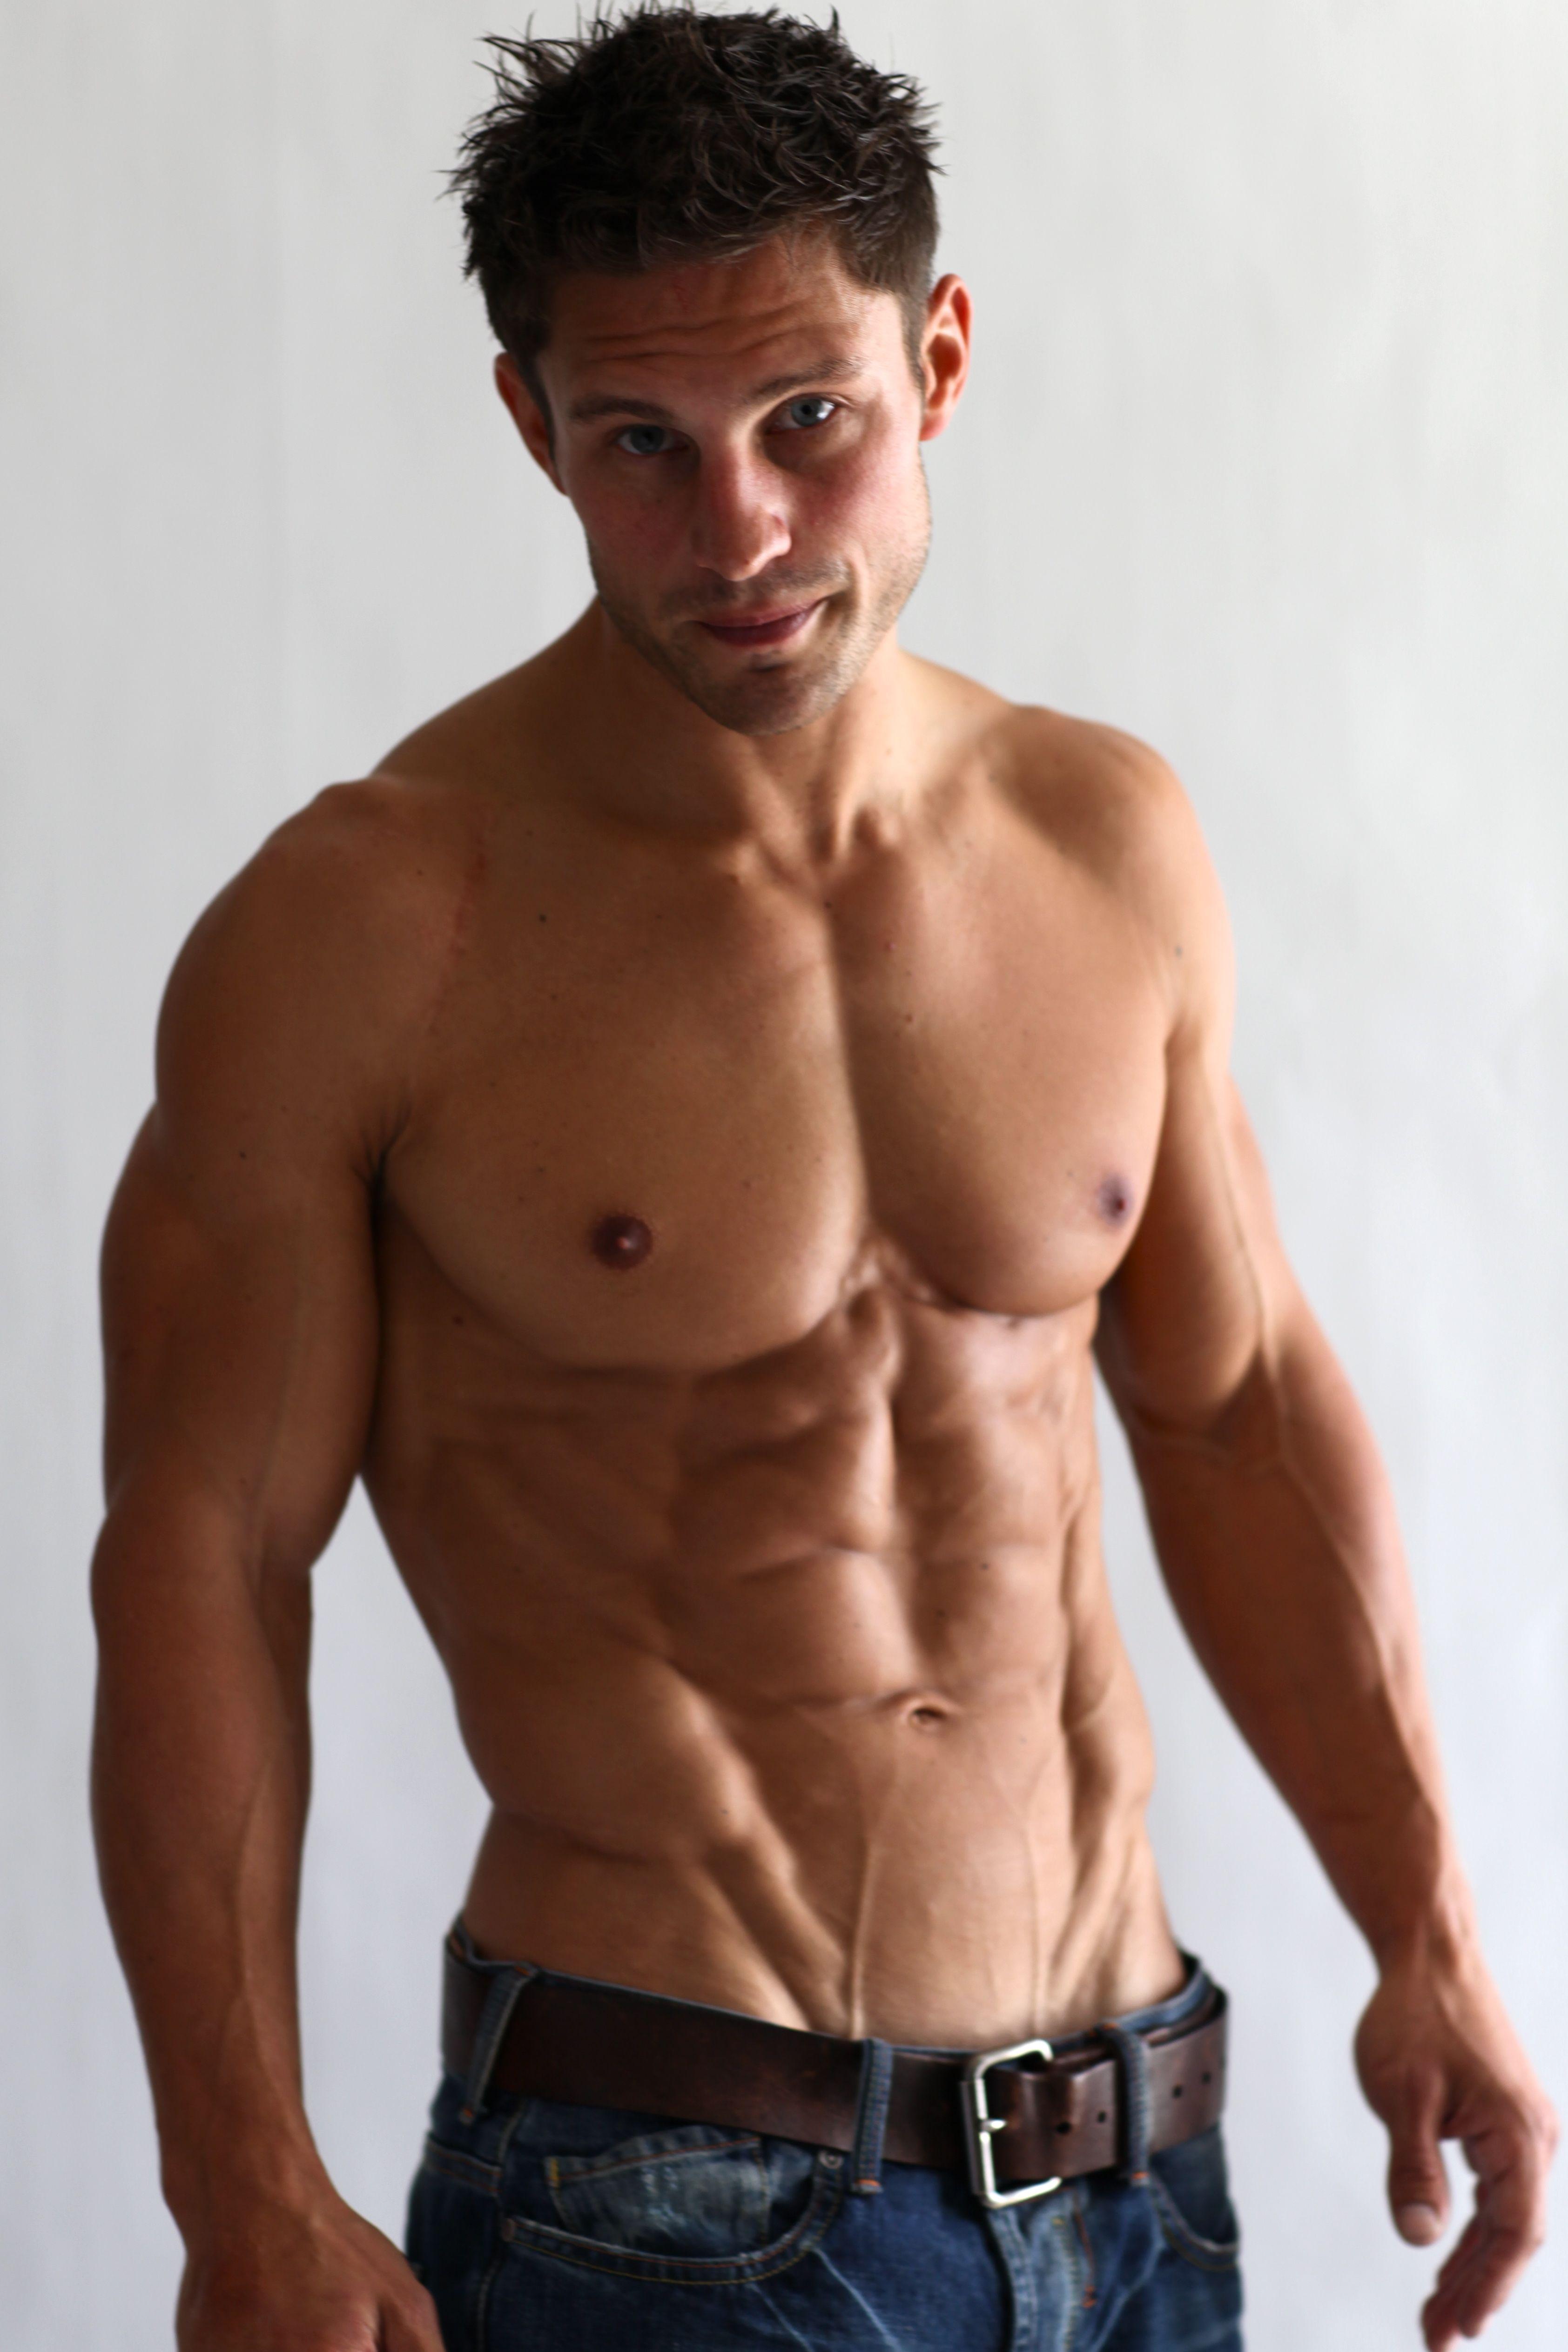 la fitness trainer